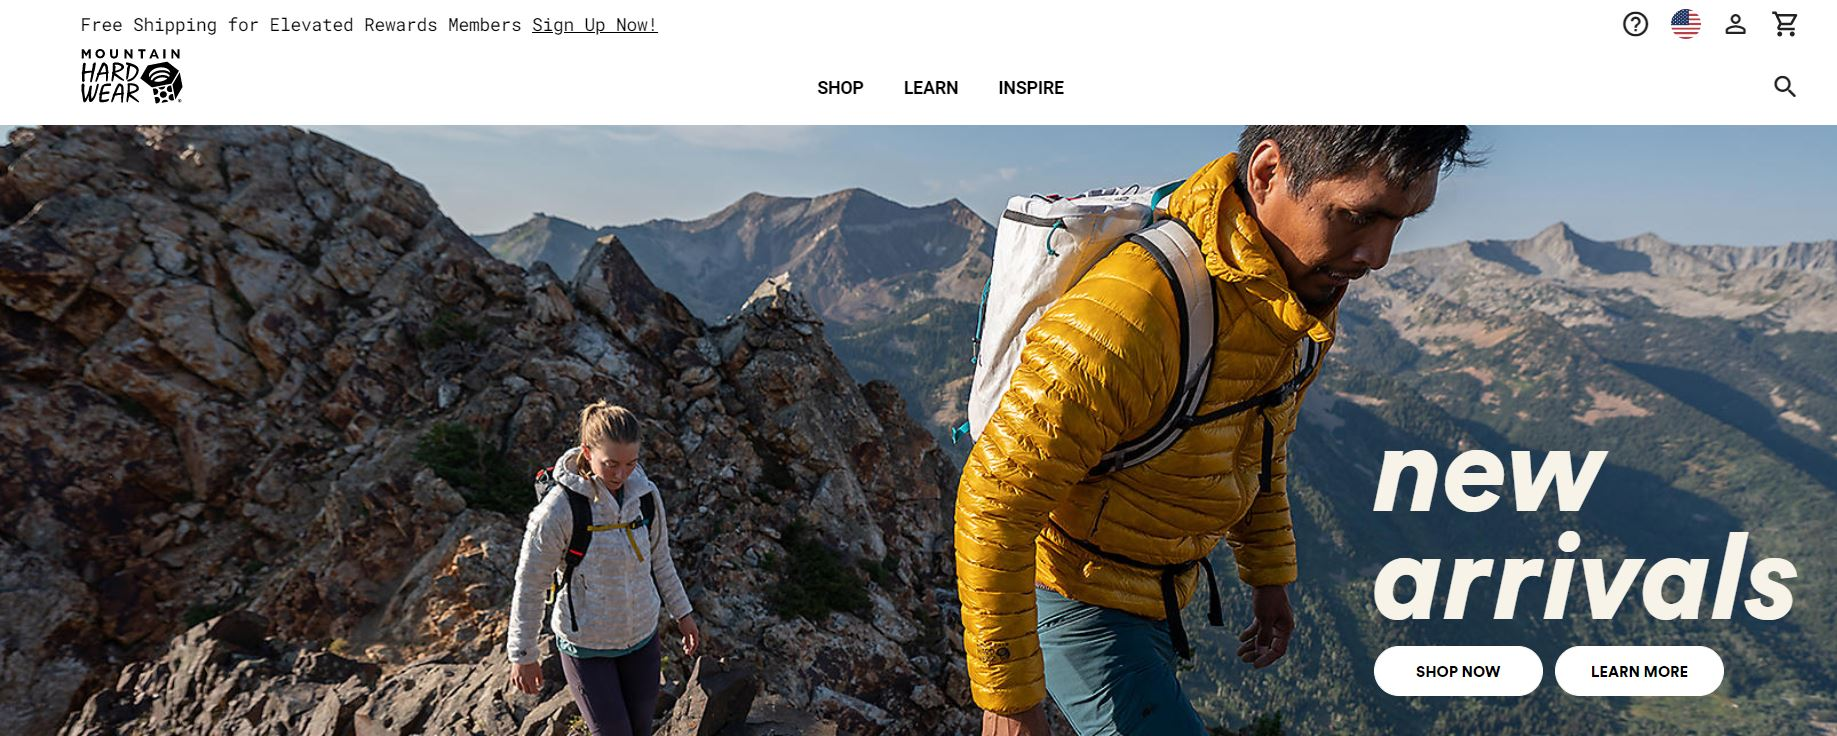 mountainhardwear - 2